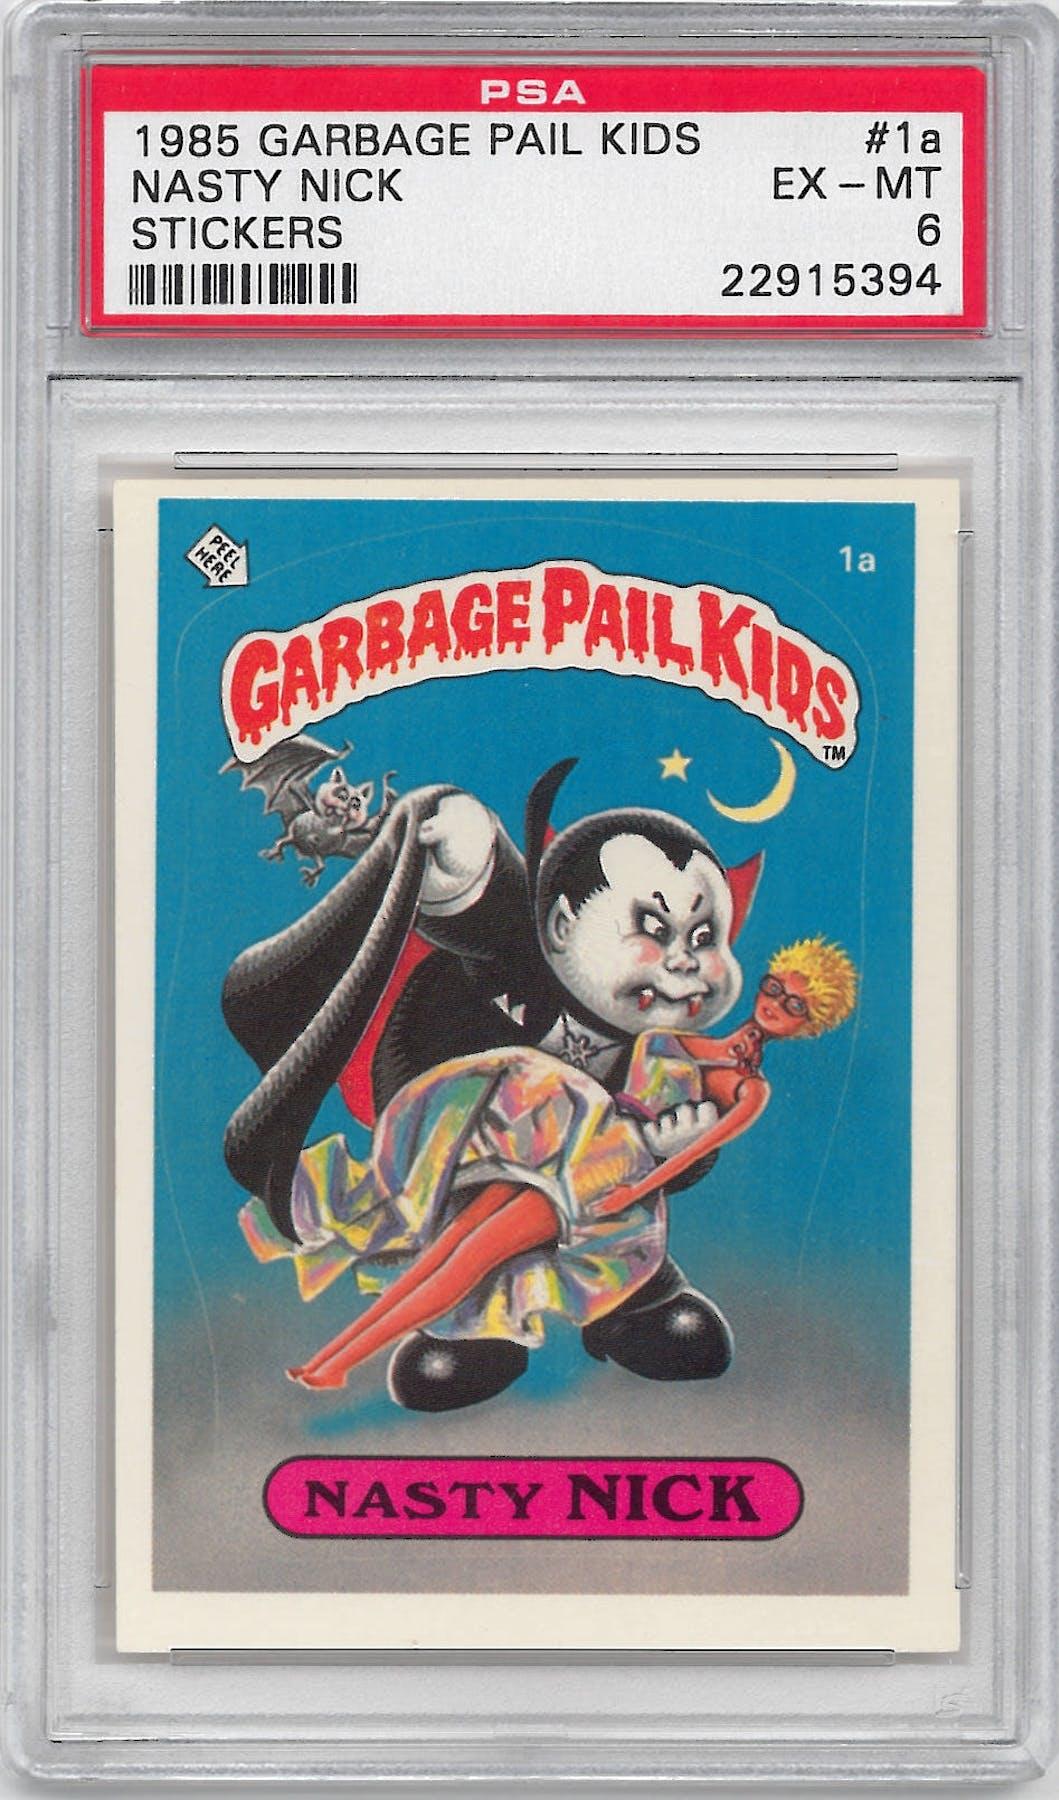 6dd44bf87f6 1985 Garbage Pail Kids Stickers  1a Nasty Nick PSA 6 (EX-MT)  5394 ...